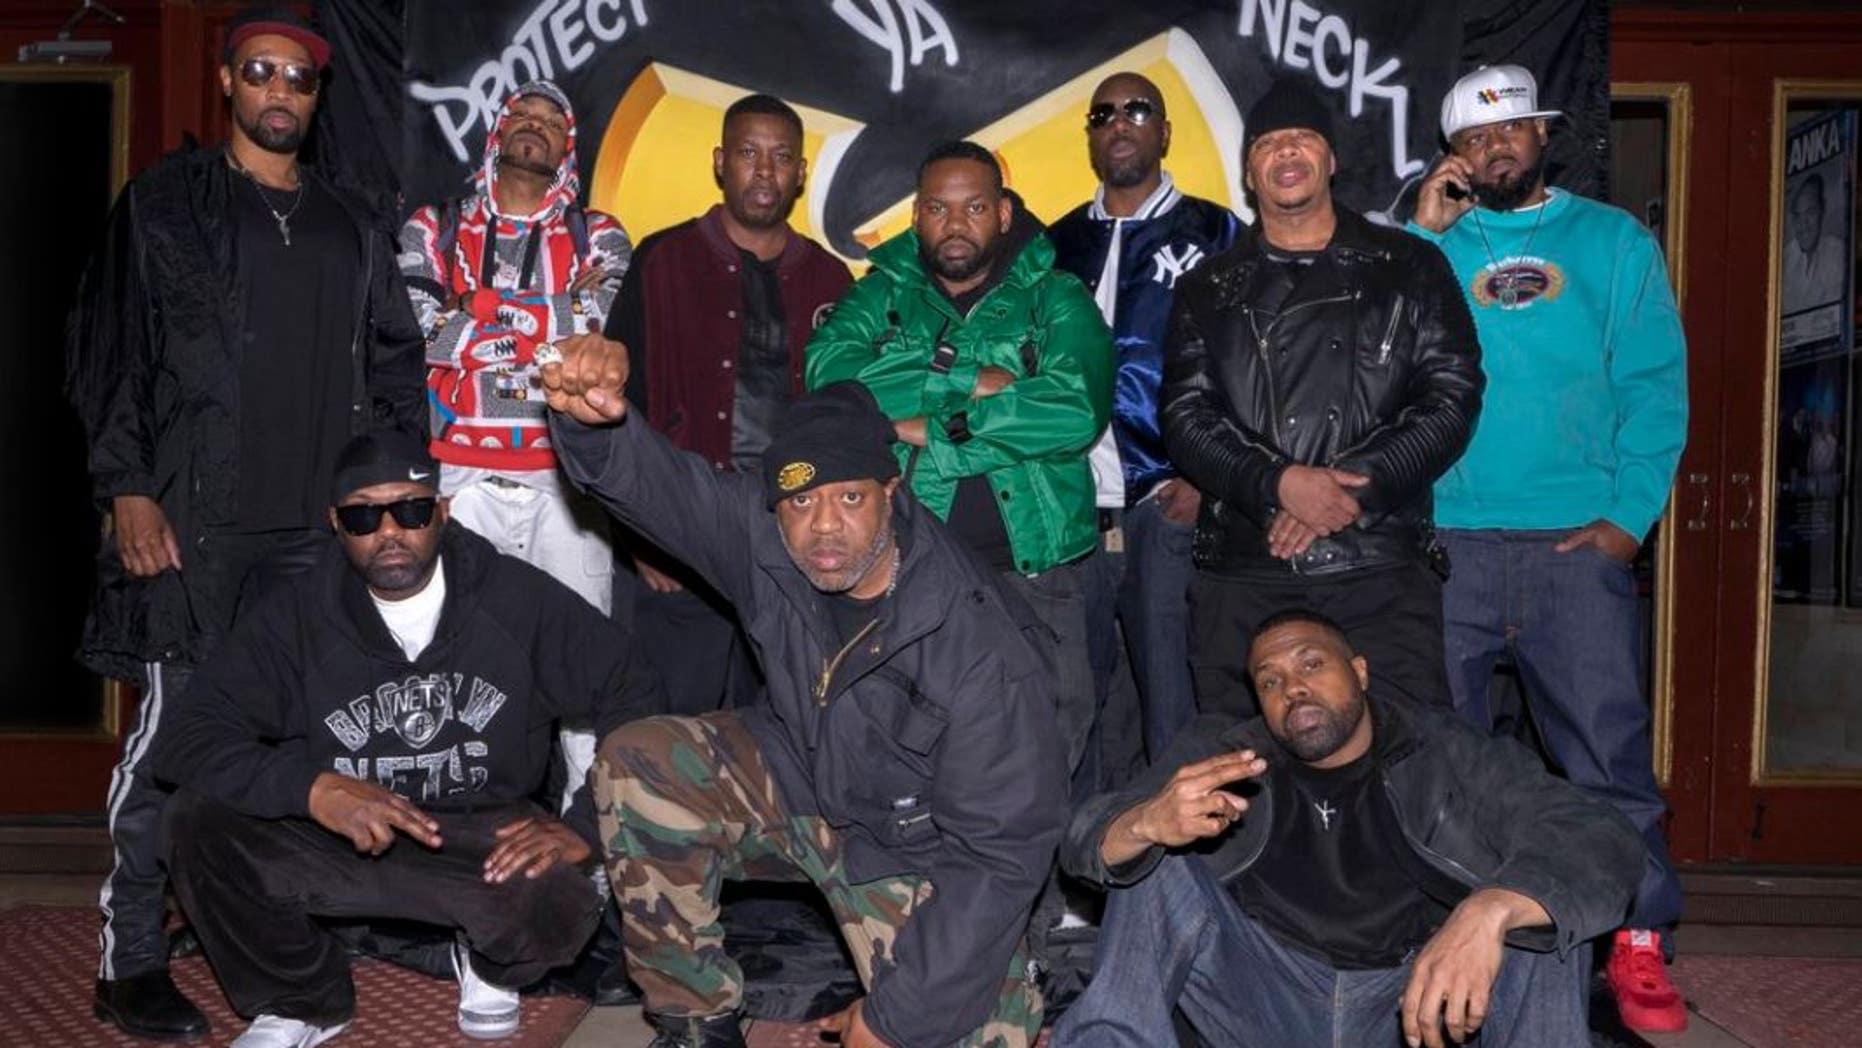 Wu-Tang Clan will headline Nashville's Ryman Auditorium on June 9. (Twitter)